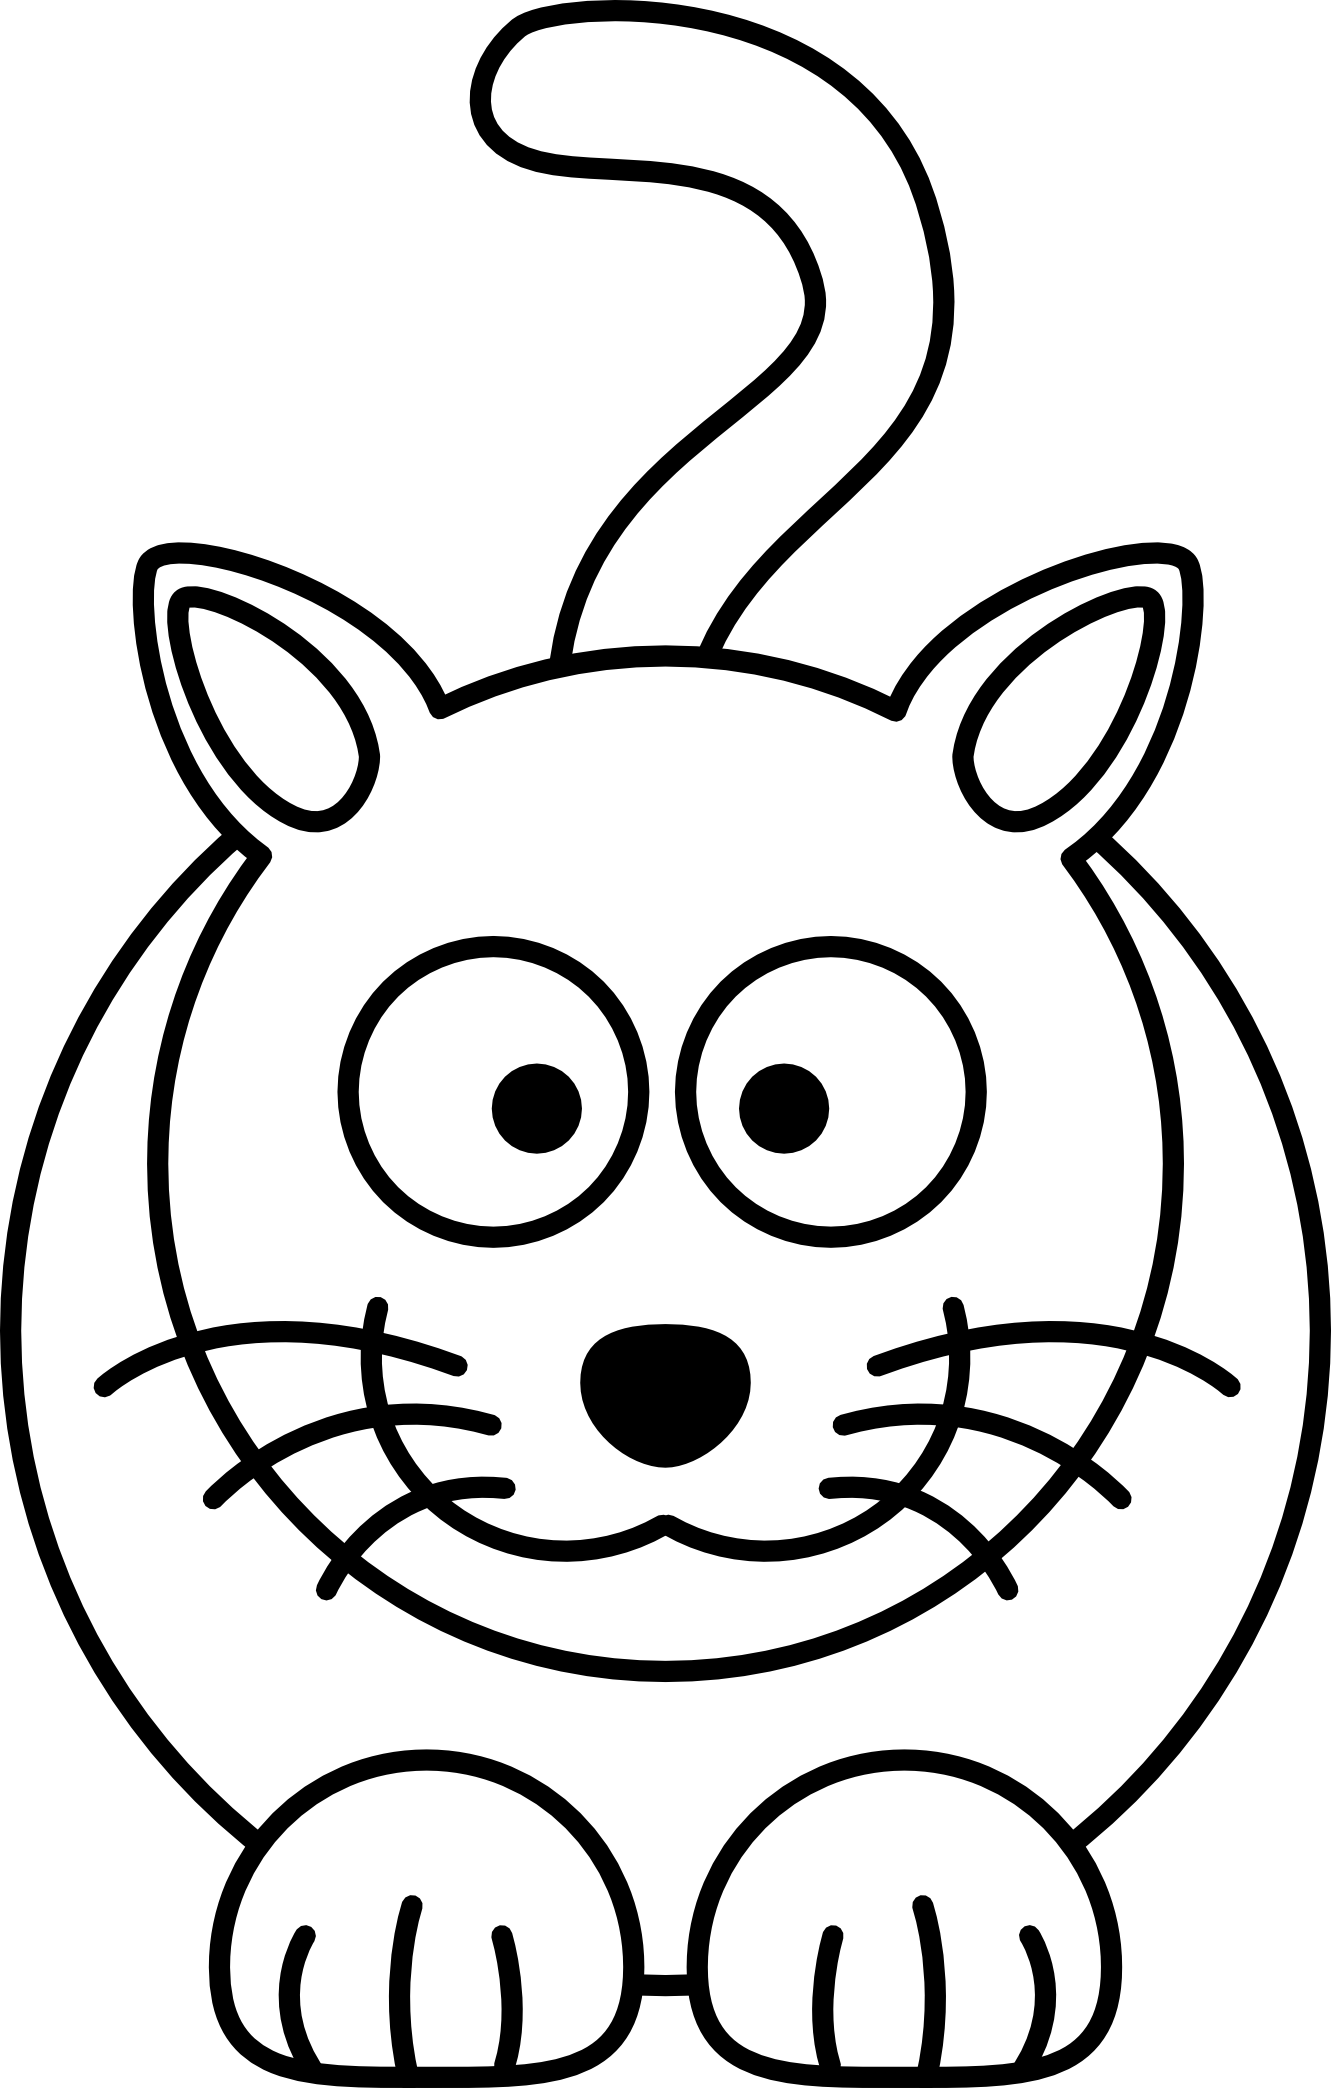 Free Simple Line Drawings .-Free Simple Line Drawings .-11